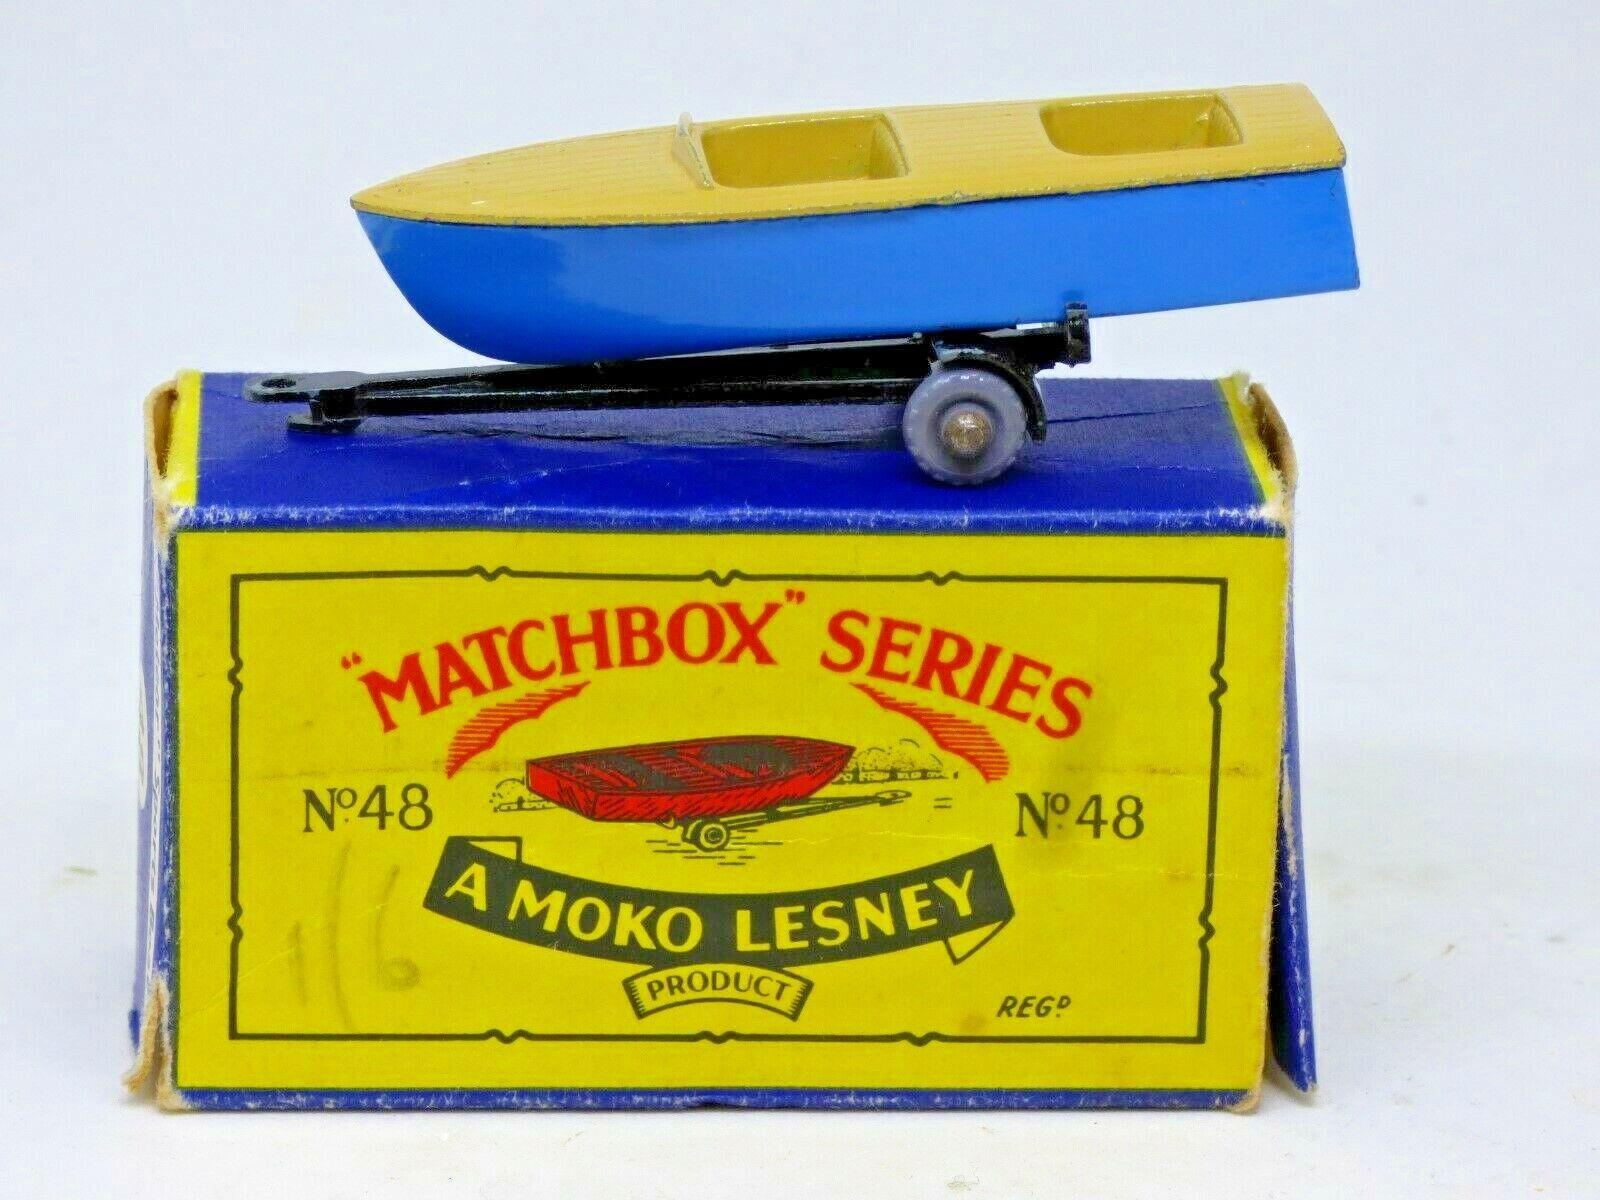 Matchbox Matchbox Matchbox Series Moko Lesney Meteor Sportsman MkII boat in original B4 box 0795d2